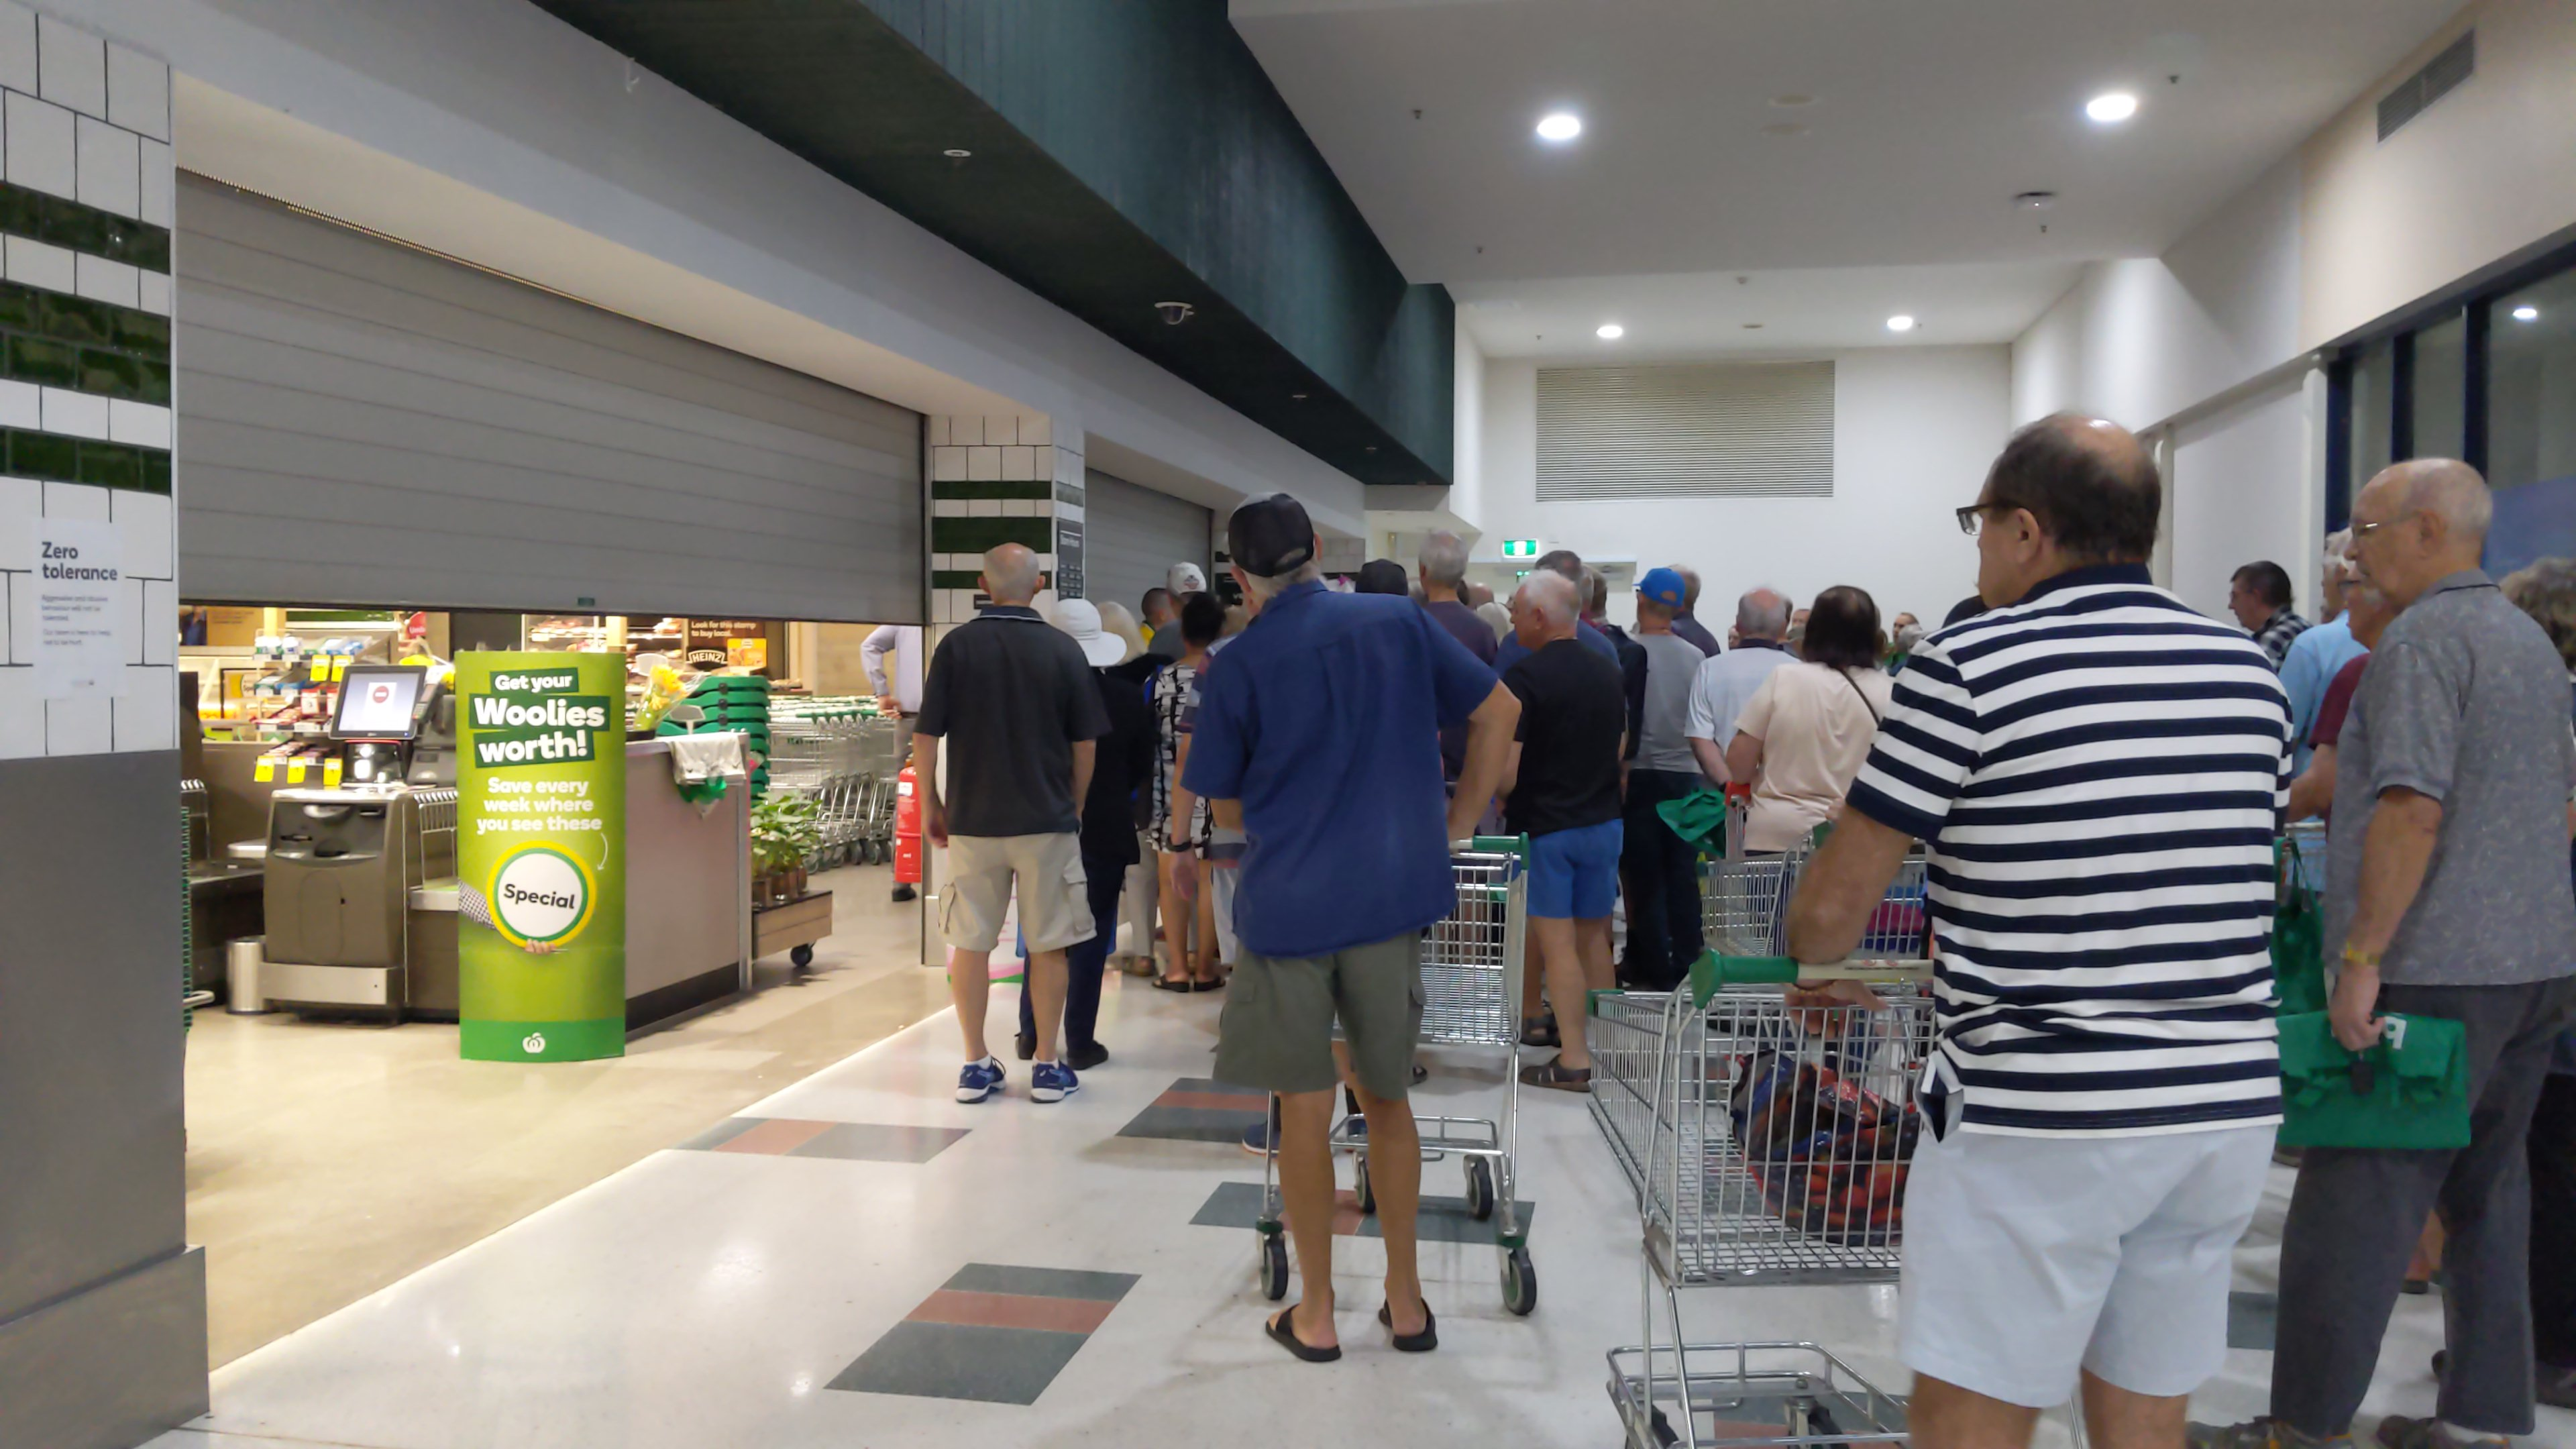 Early morning shopper struggle